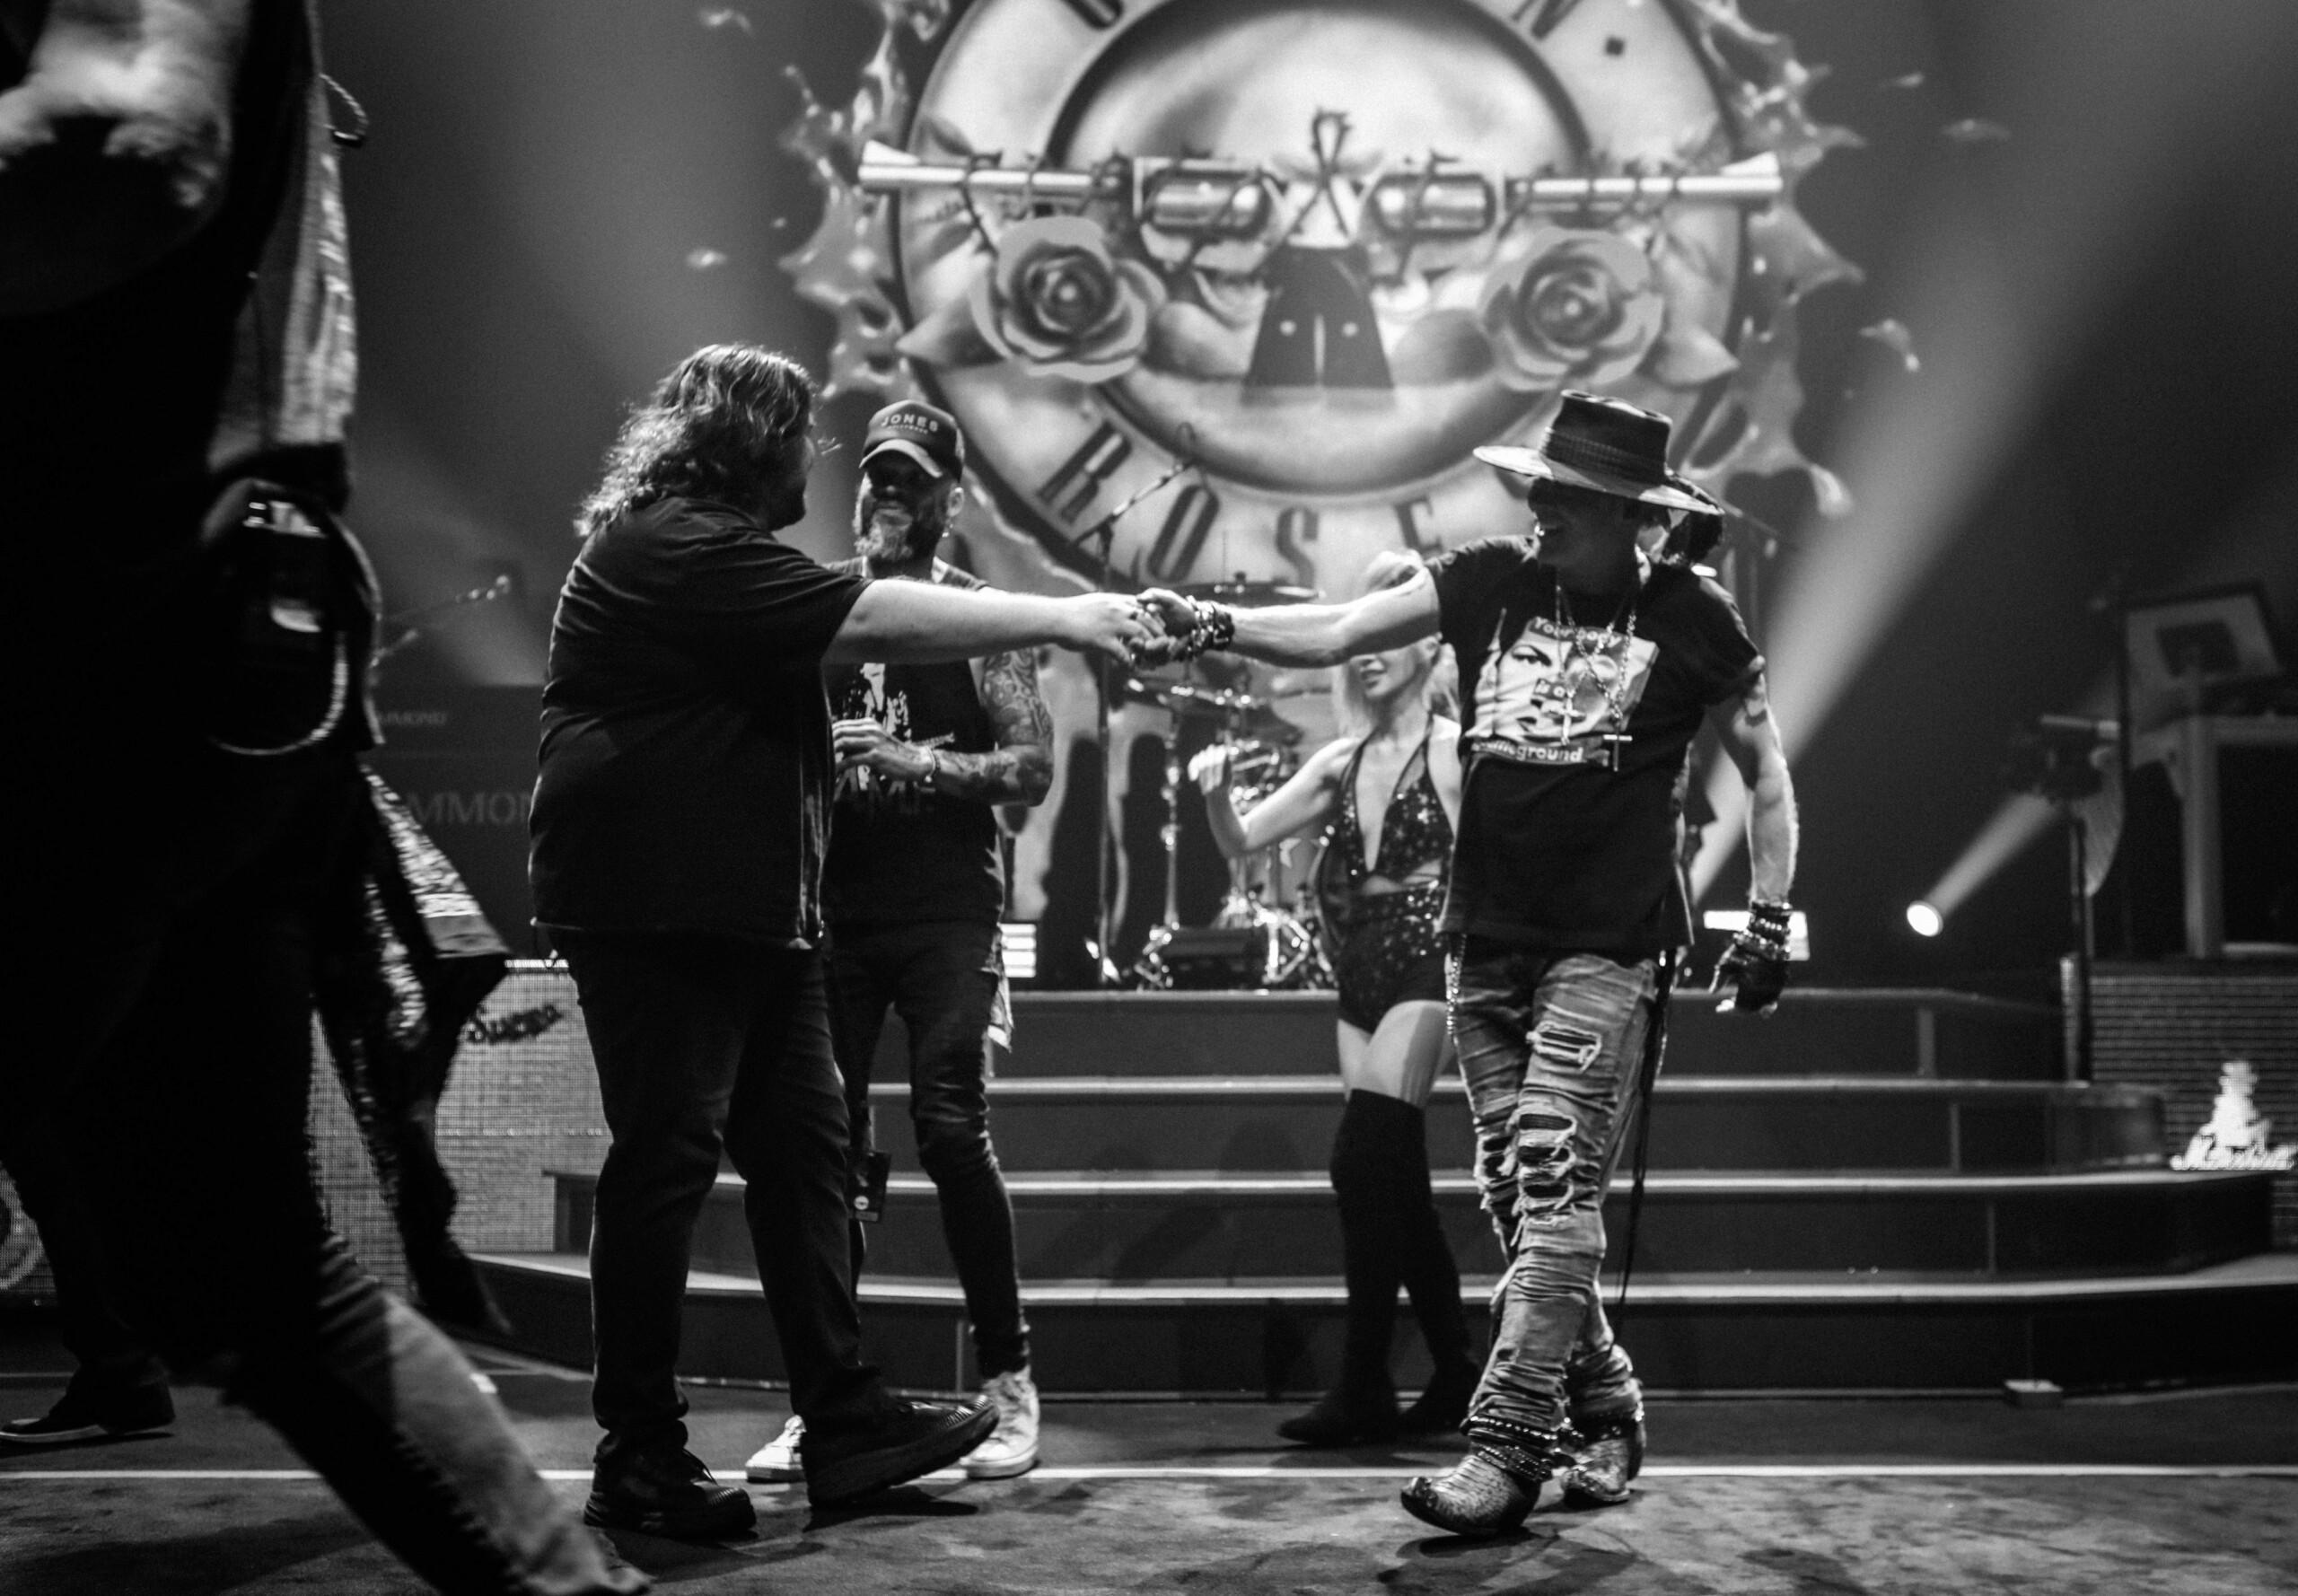 2021.10.03 - Hard Rock Live Arena, Hollywood, FL, USA. Fbrwqk11